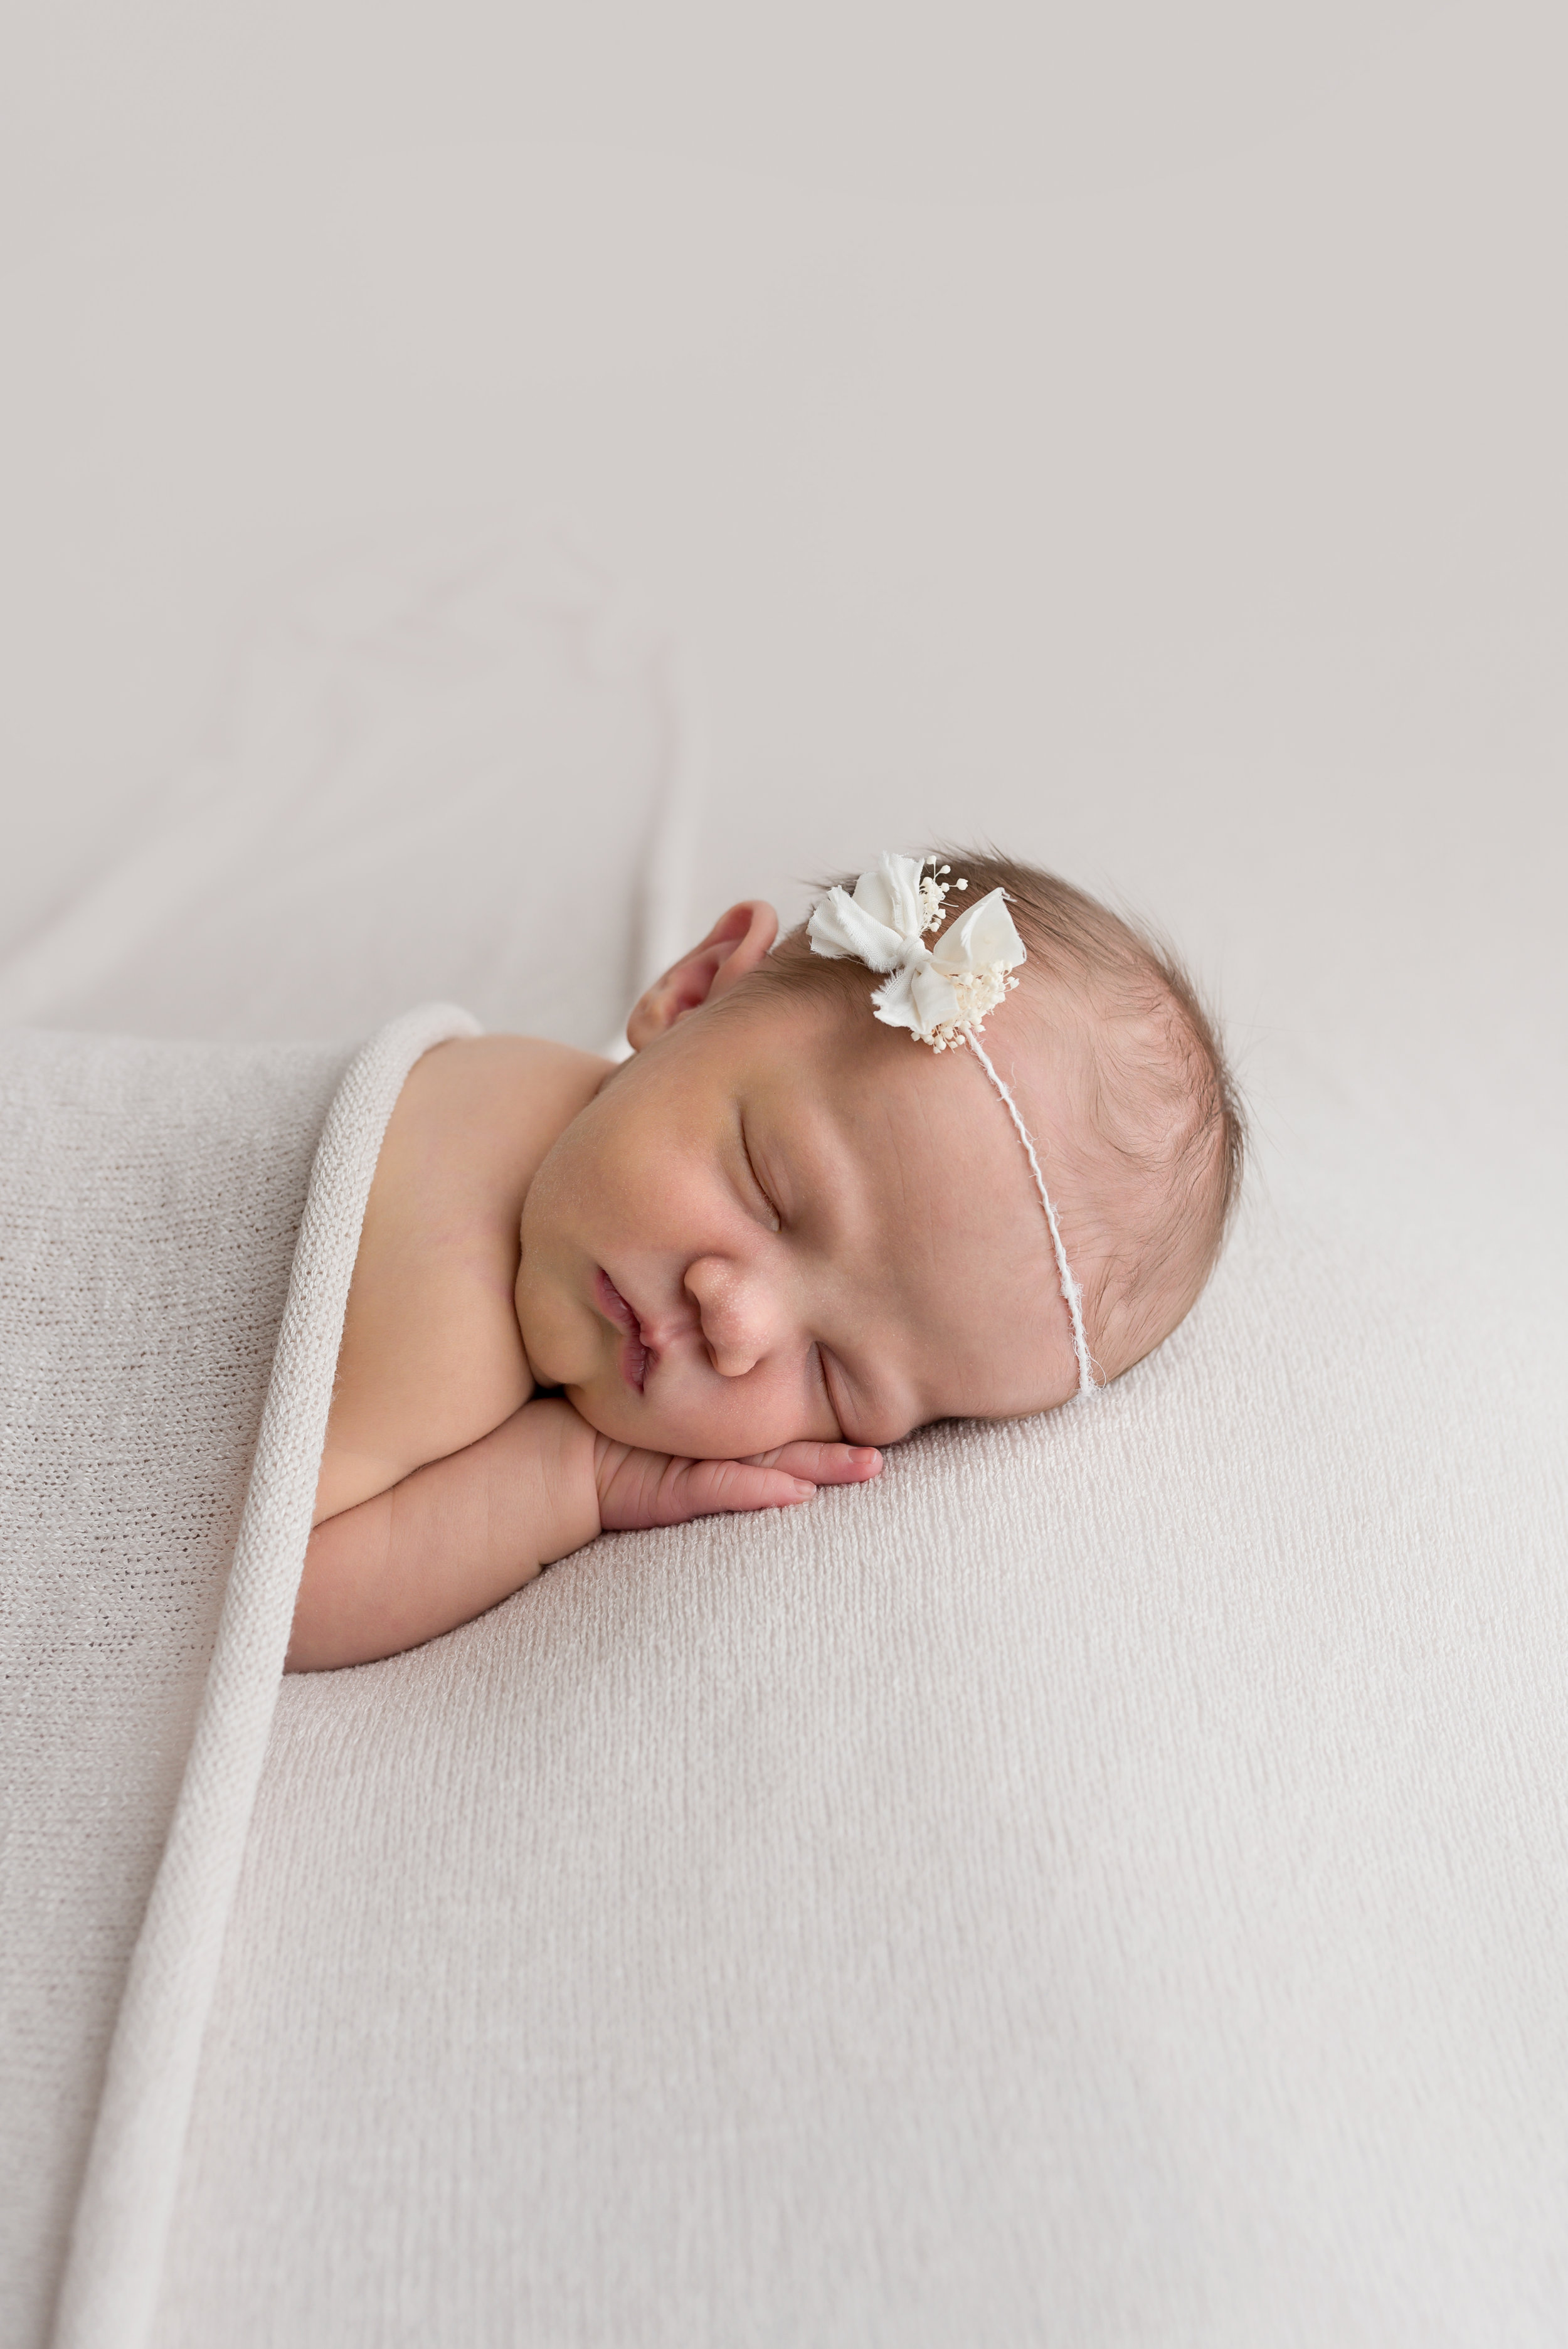 Charleston-Newborn-Photographer-Following-Seas-Photography-7150 copy.jpg